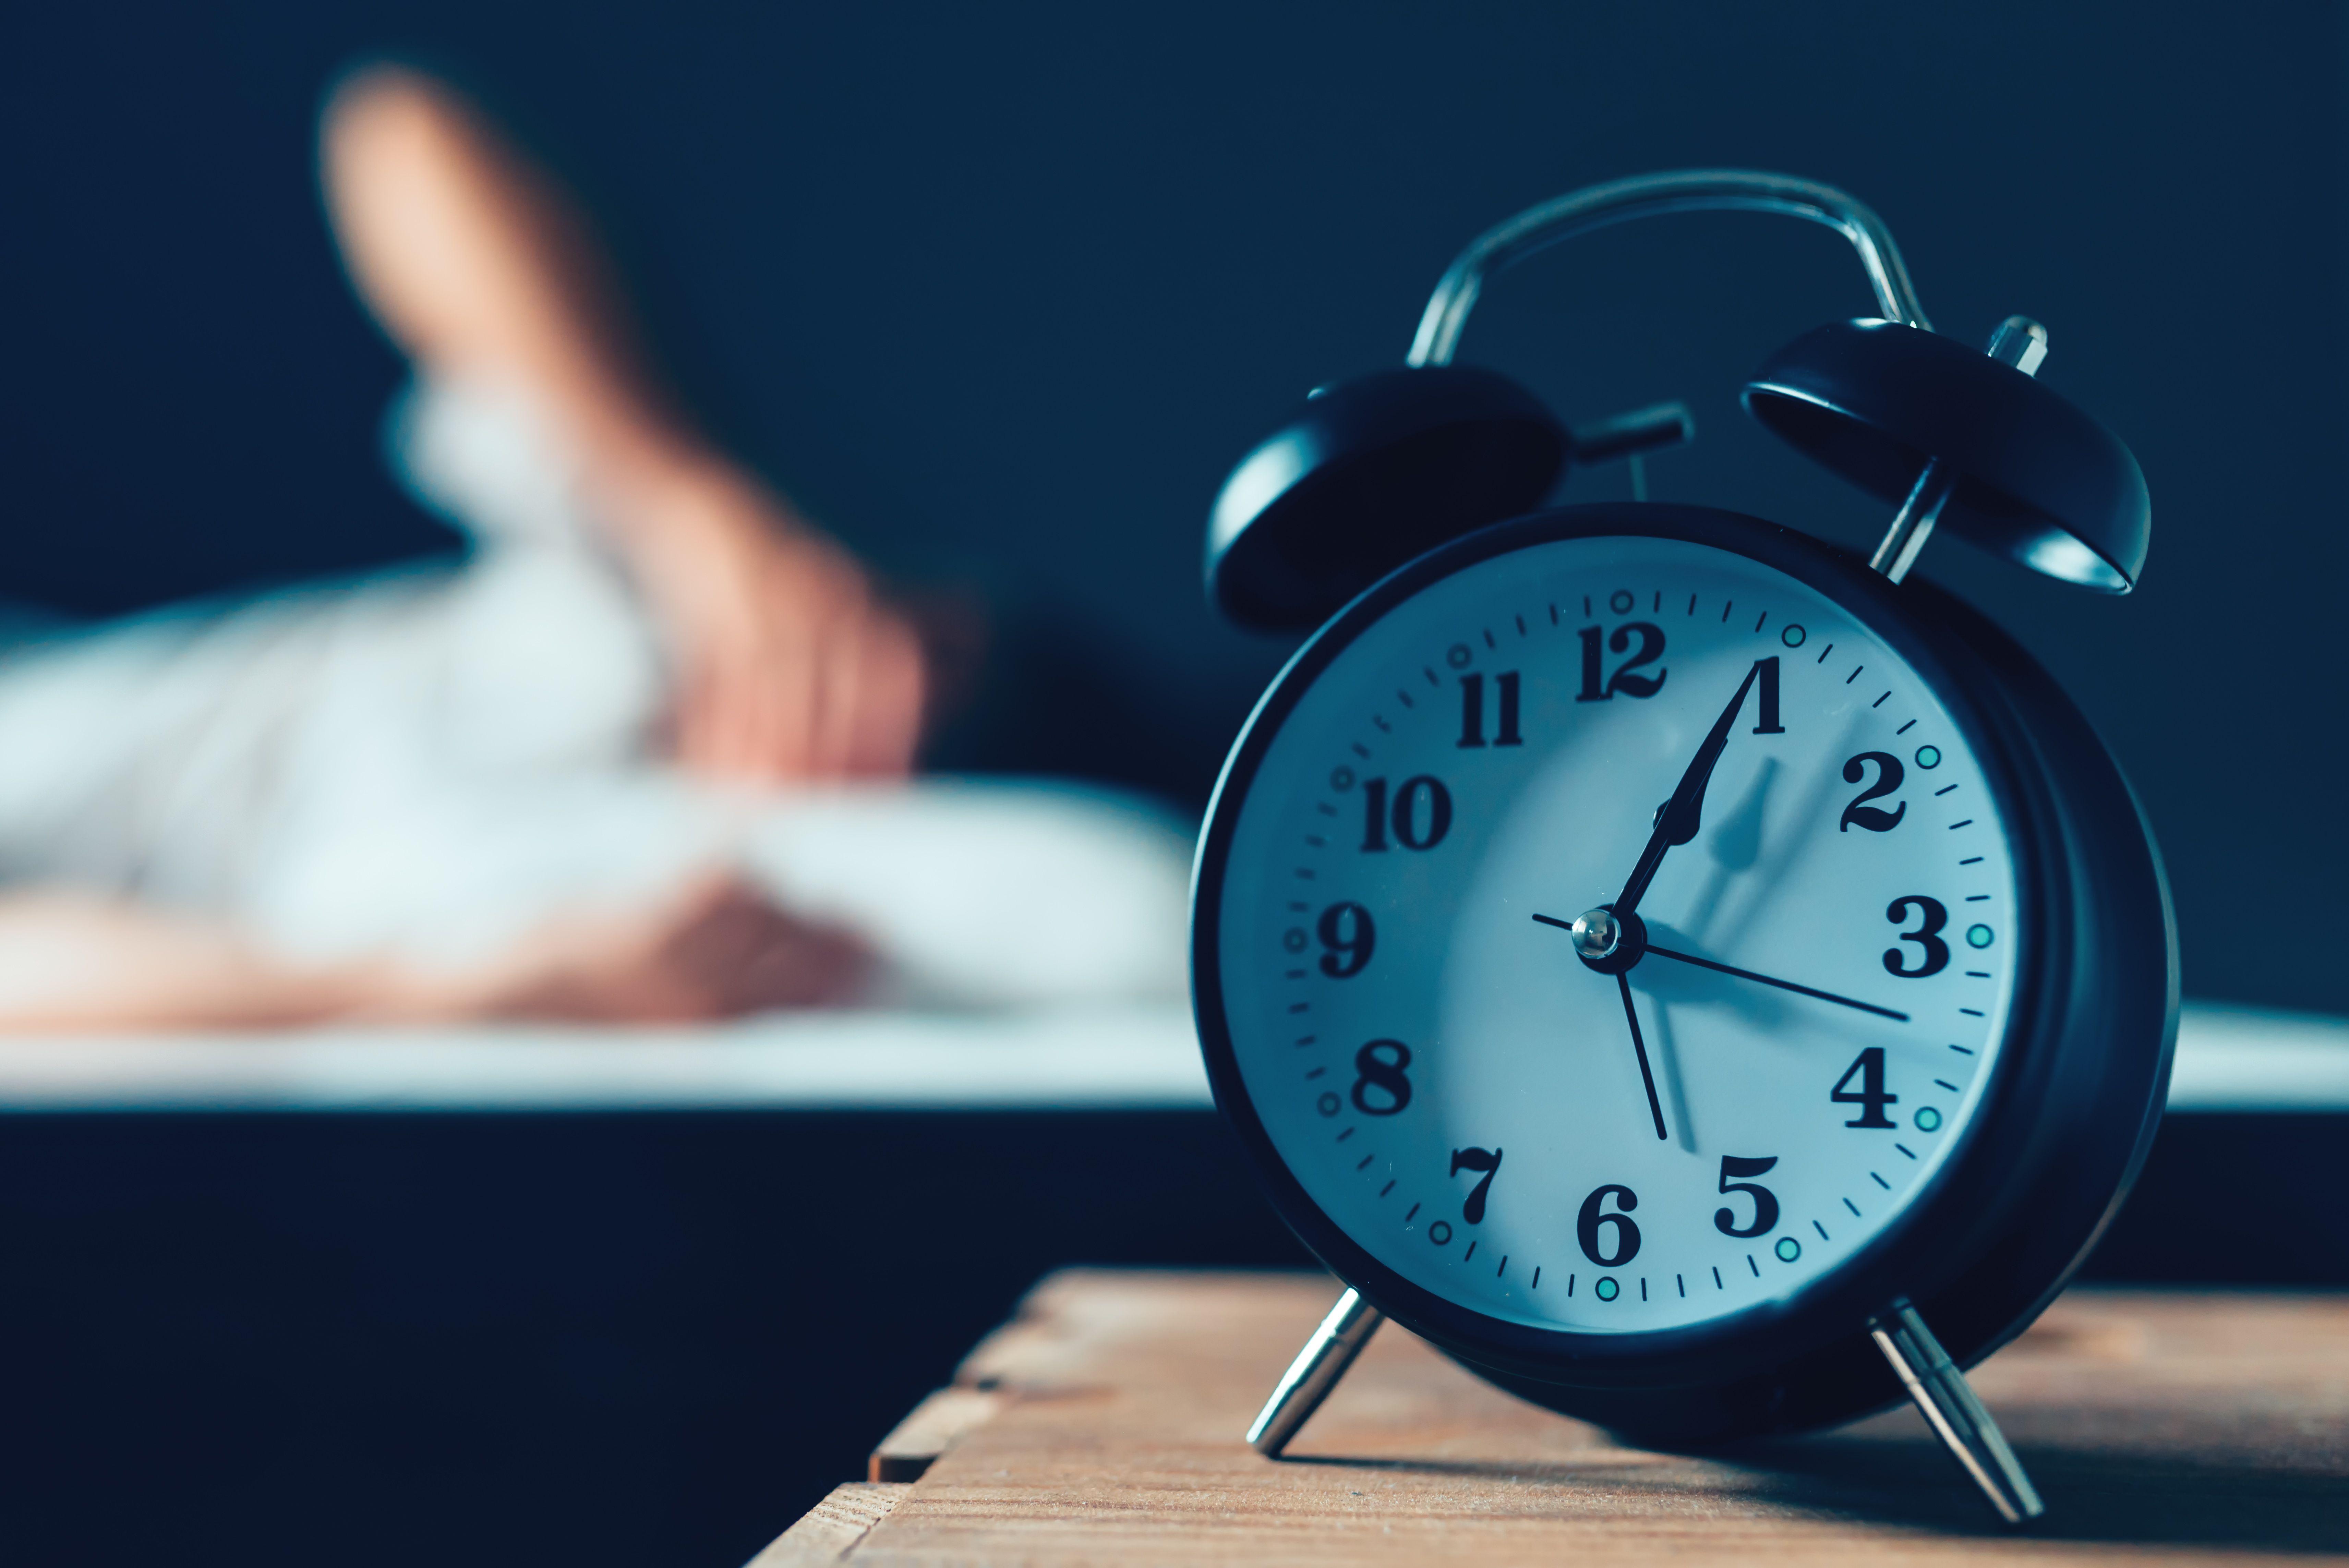 7 ways to manage sleep anxiety during the coronavirus crisis